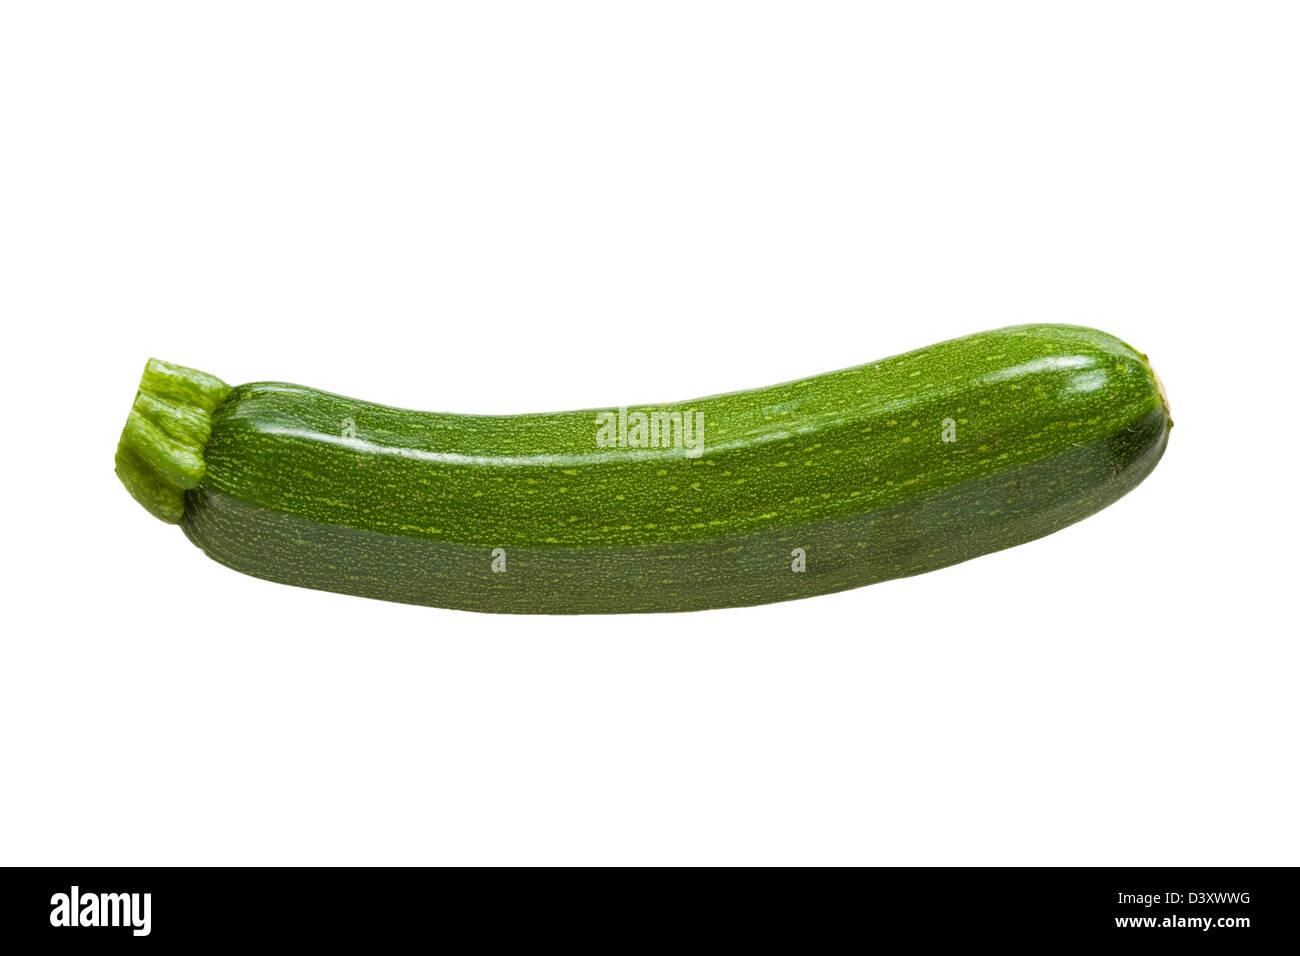 La zucchina (zucchine). Immagini Stock